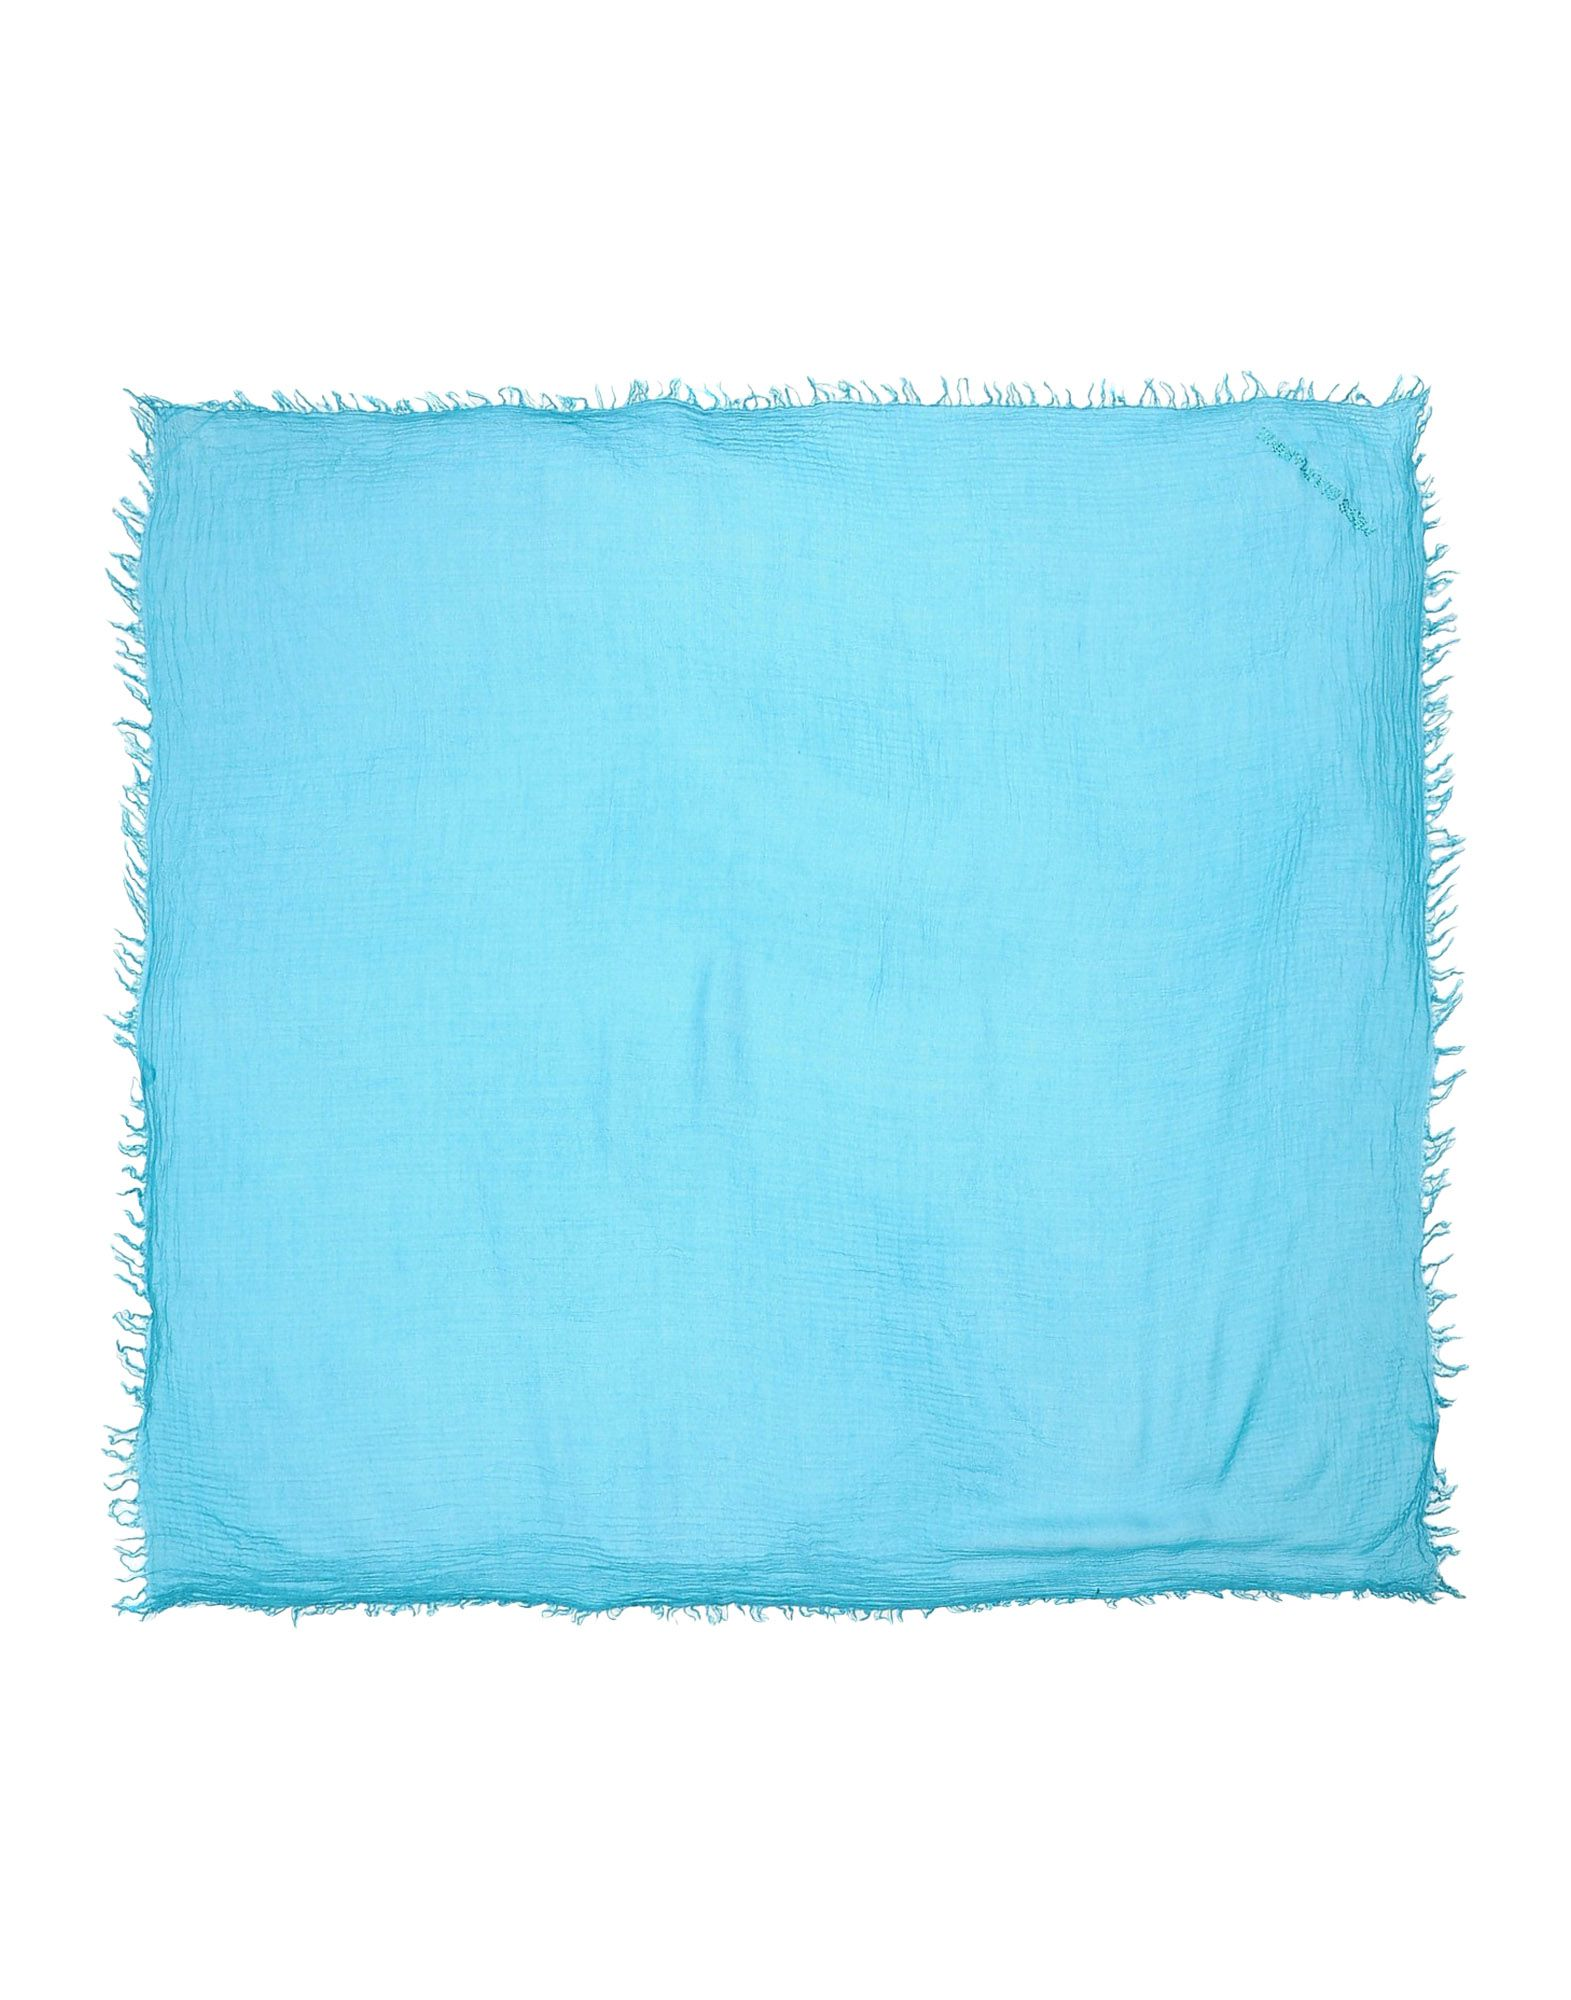 MISS BLUMARINE JEANS Платок miss blumarine jeans платок